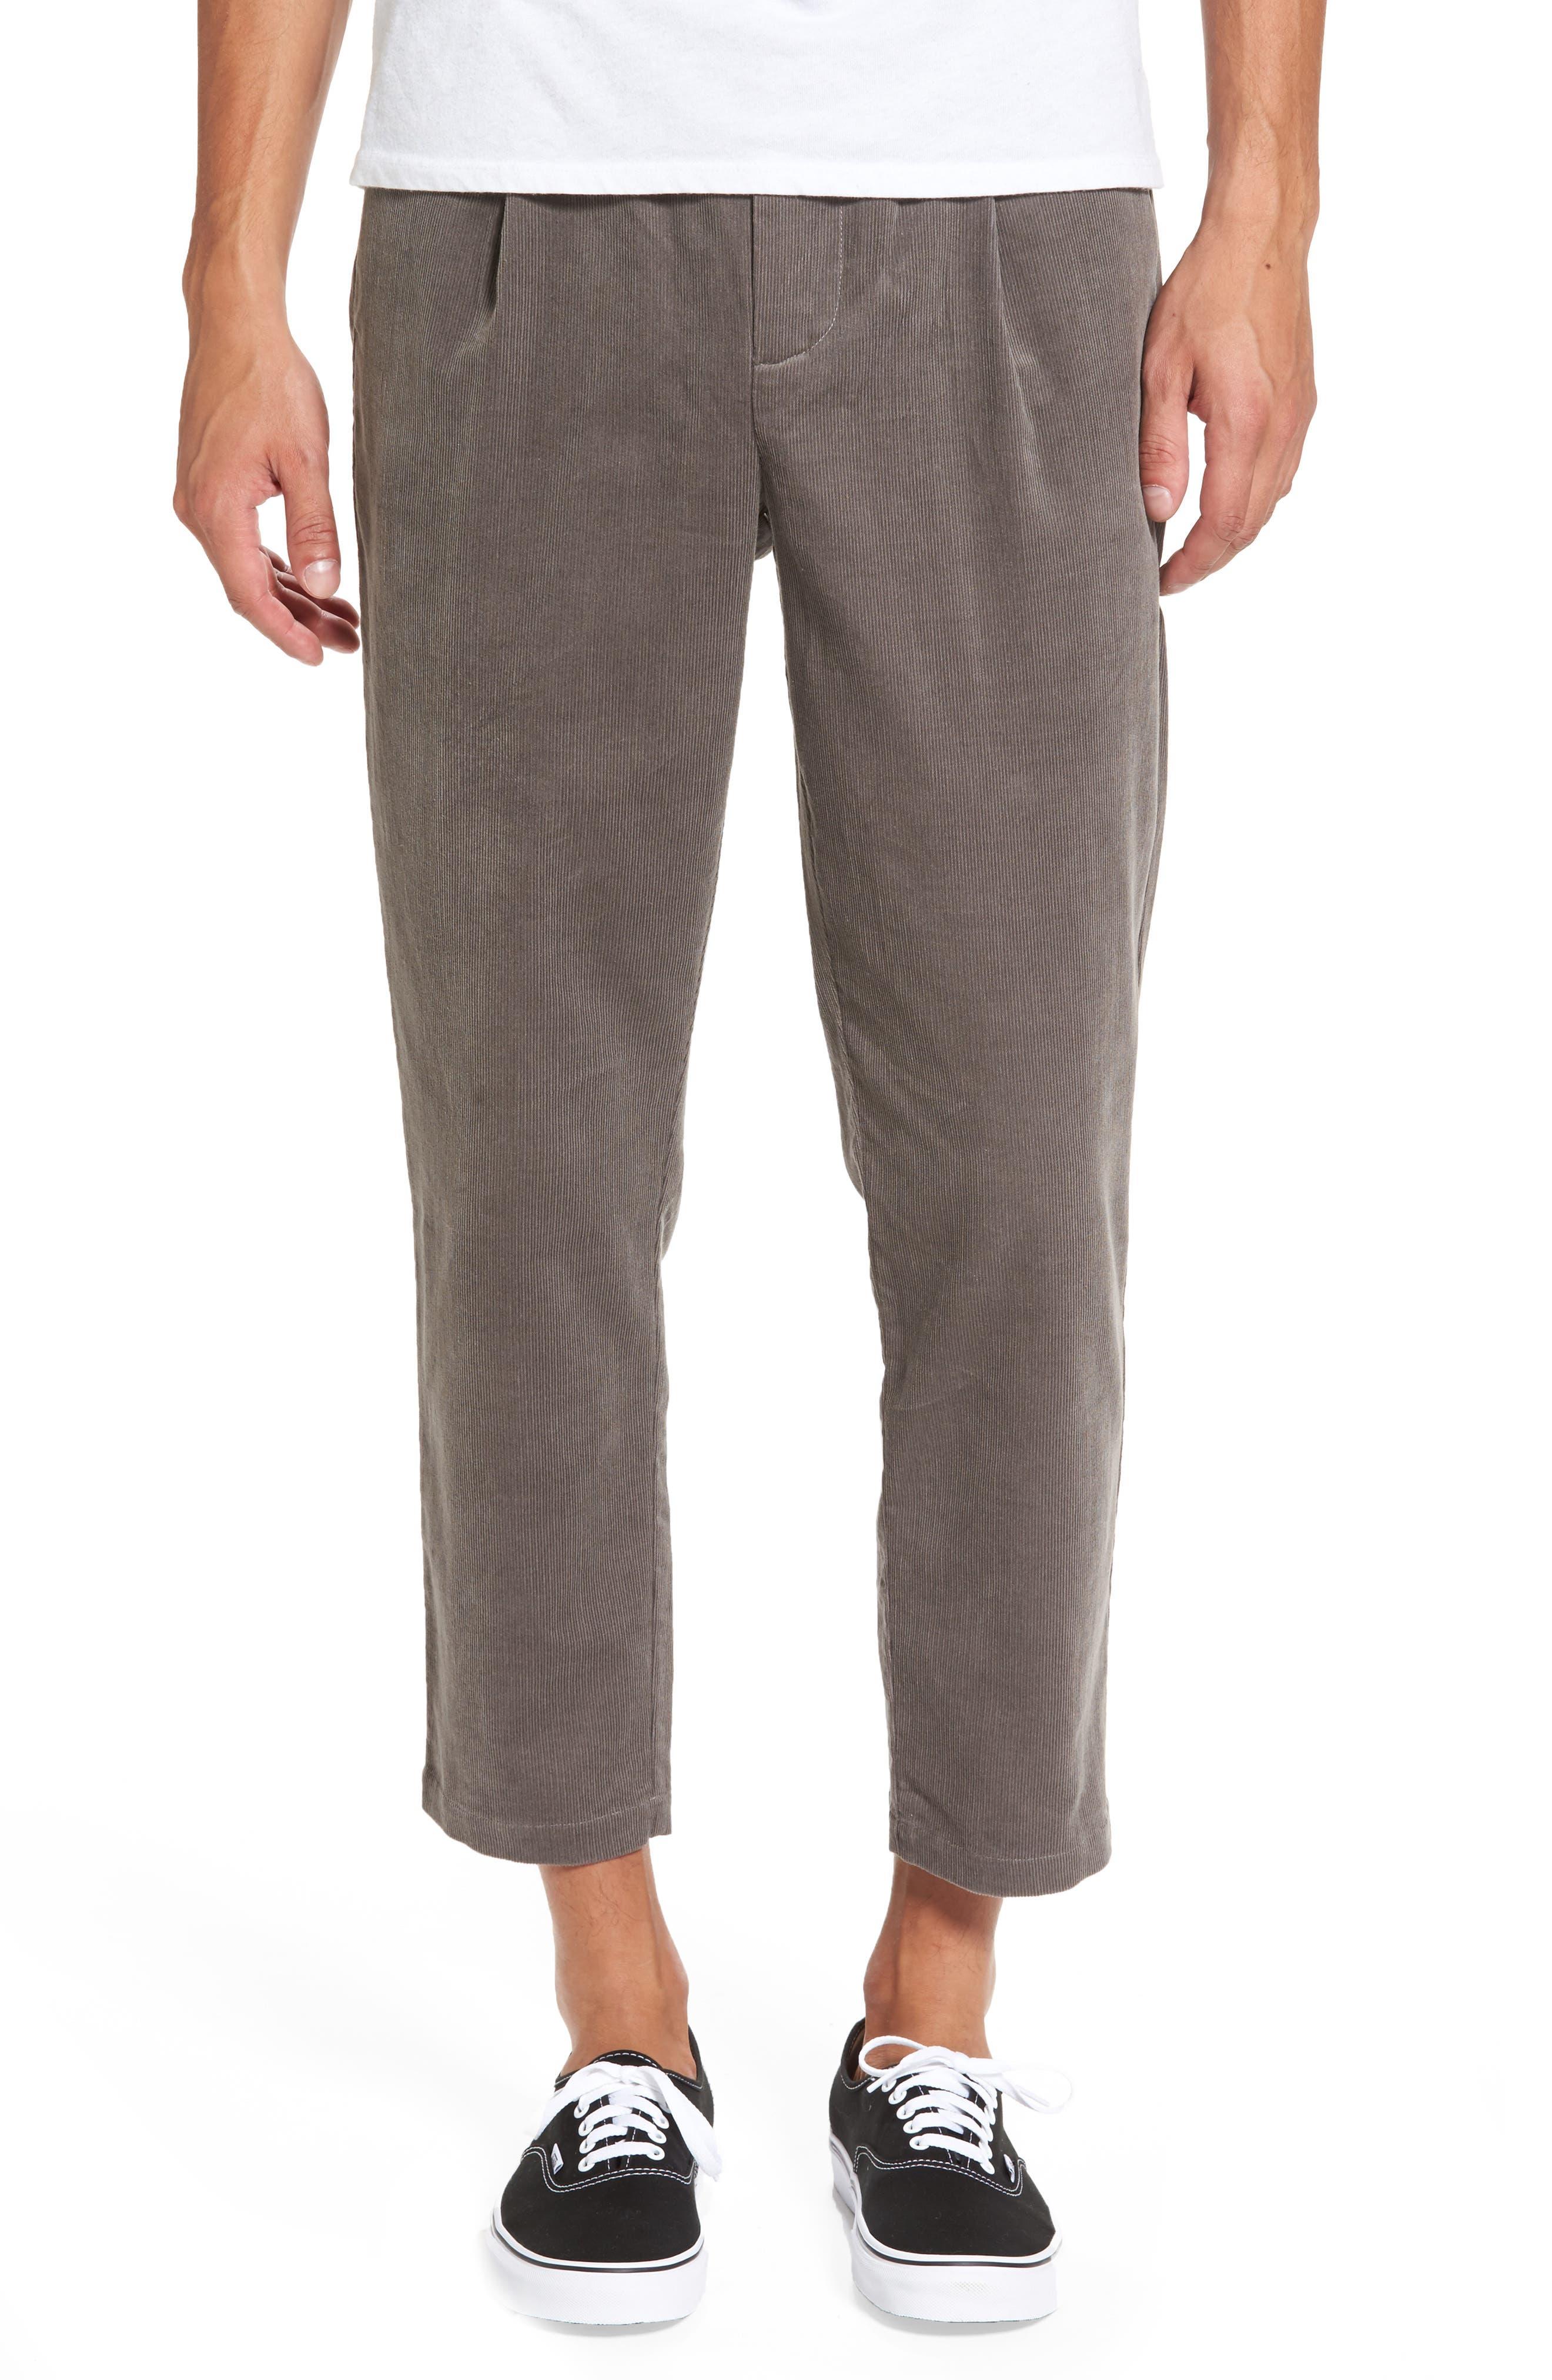 Astbury Crop Corduroy Pants,                             Main thumbnail 1, color,                             024